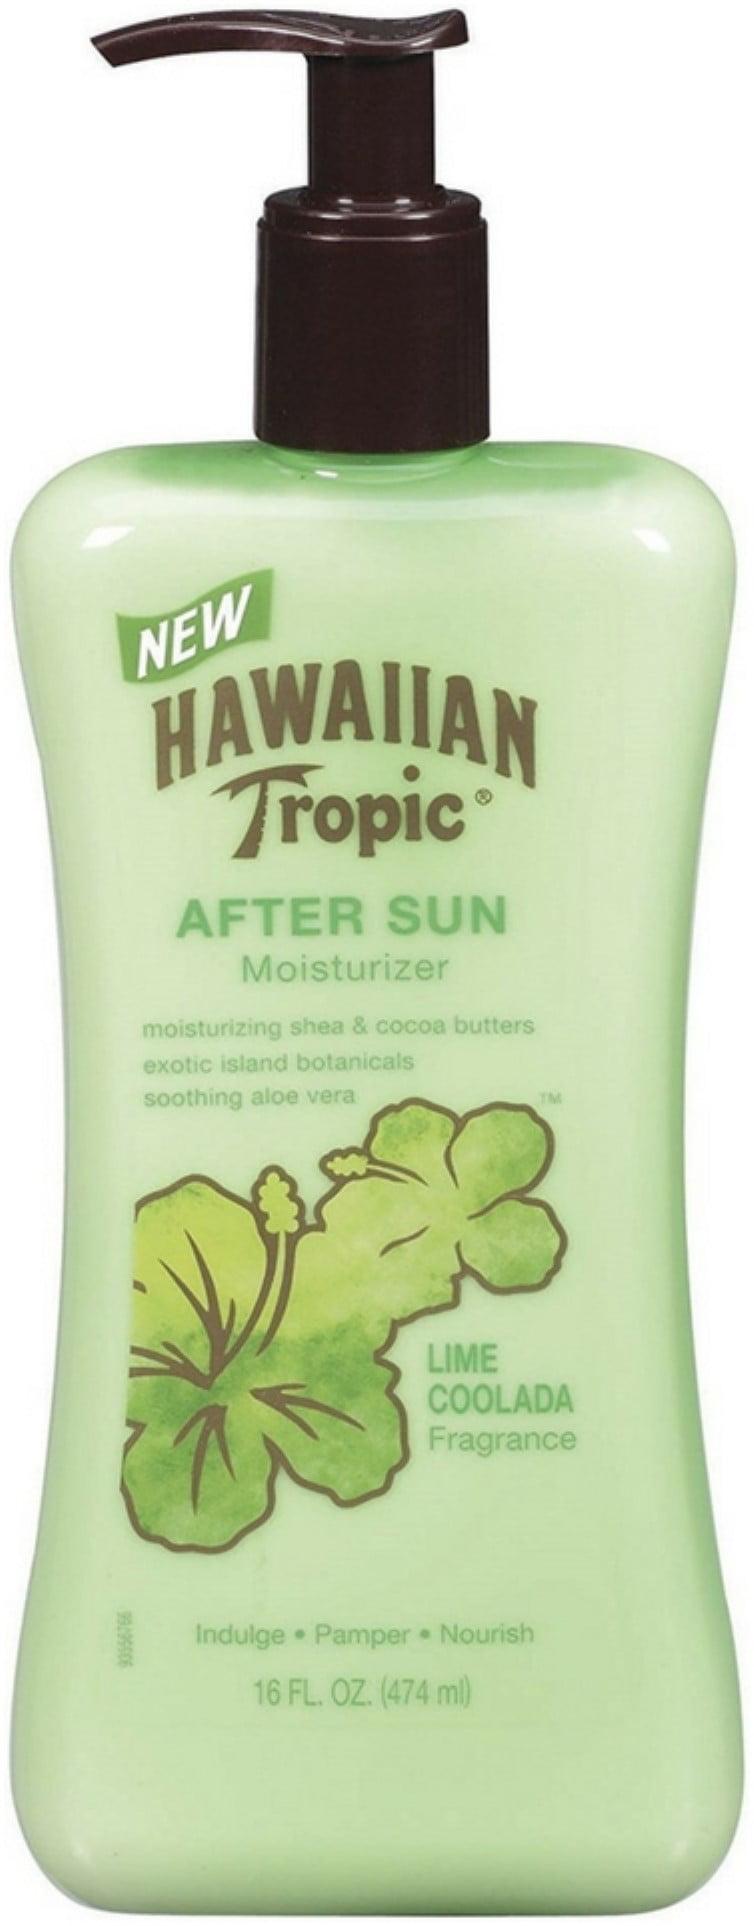 Lime Coolada After Sun Moisturizer Green by Hawaiian Tropic #14